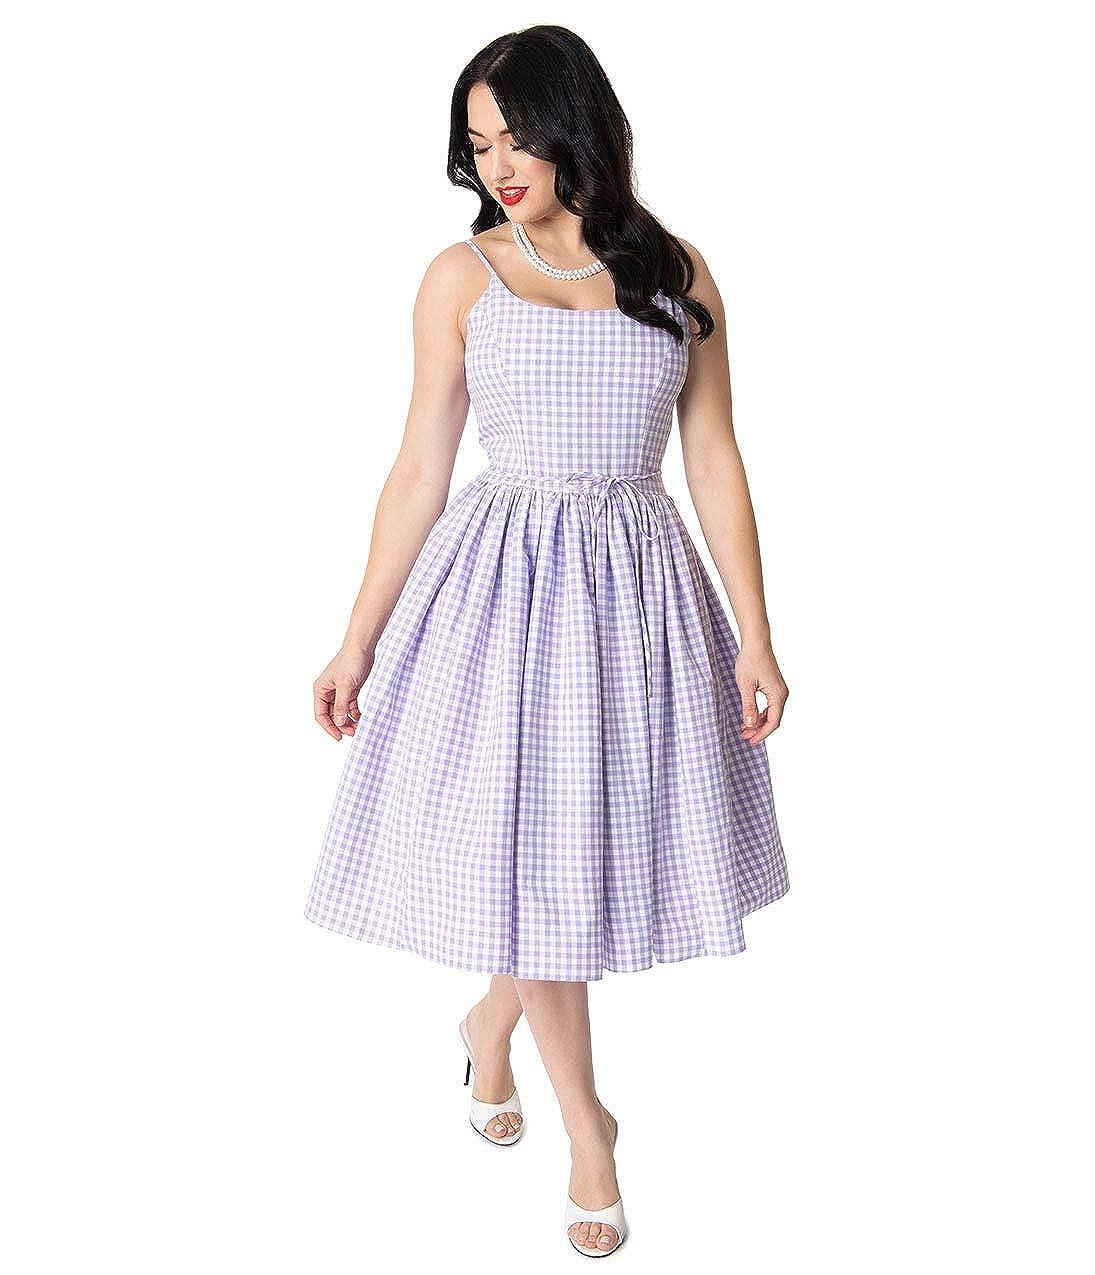 43eee2b3654e9 Bernie Dexter 1950s Lavender & White Gingham Kaelyn Swing Dress at Amazon  Women's Clothing store: